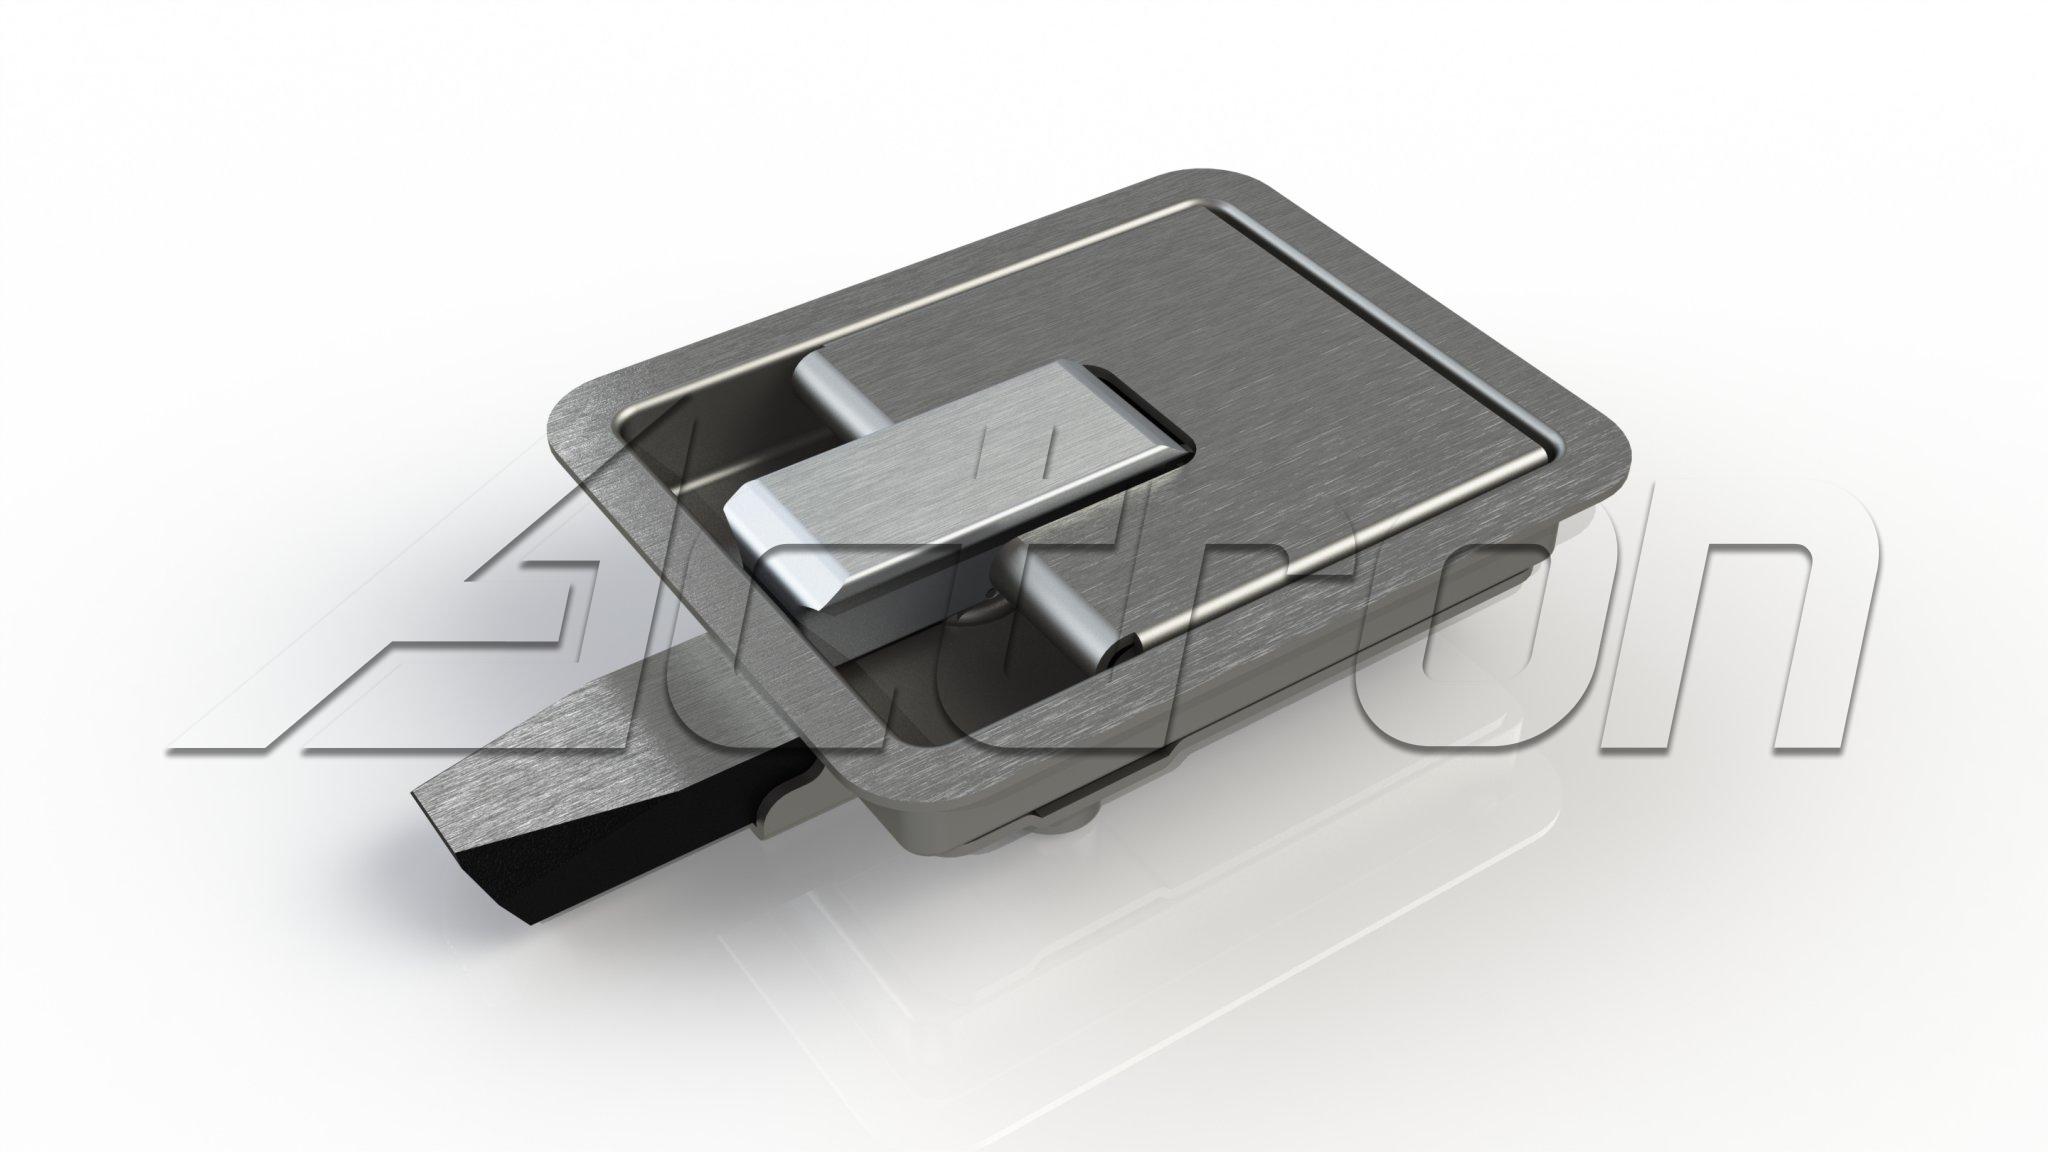 latchlock-assy-8211-sliding-4464-a27087.jpg